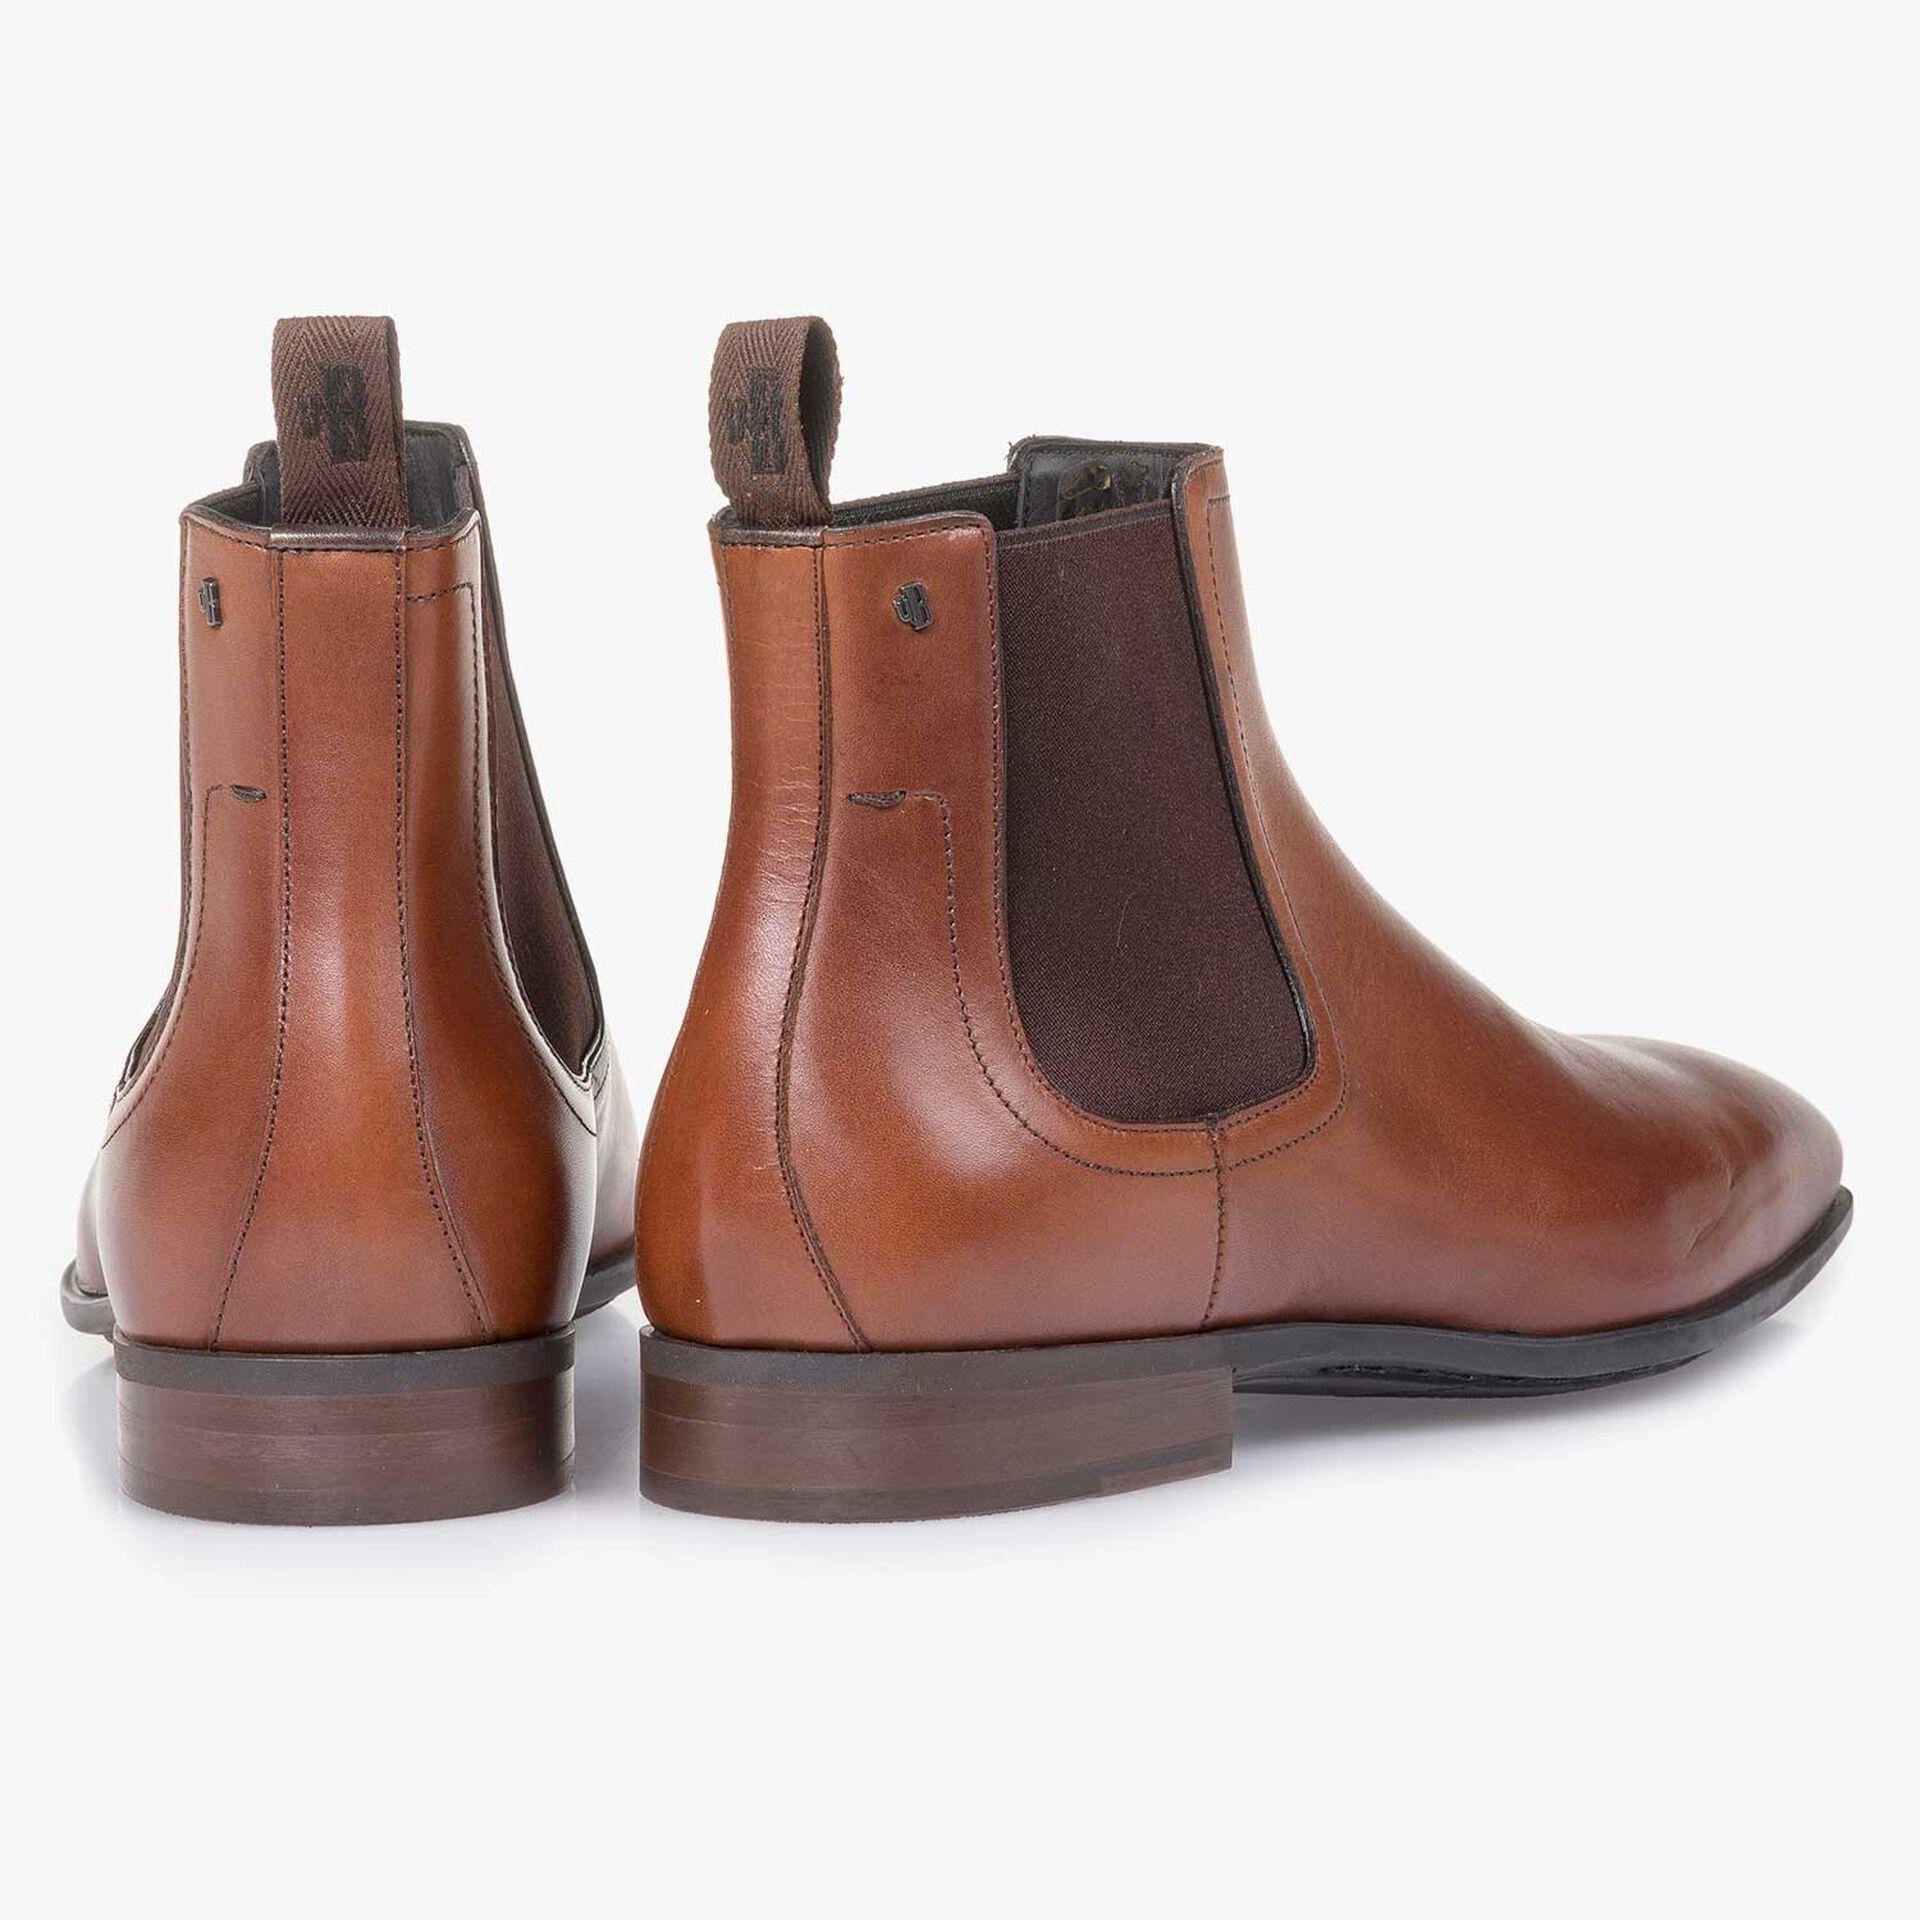 Cognac-coloured calf leather Chelsea boot